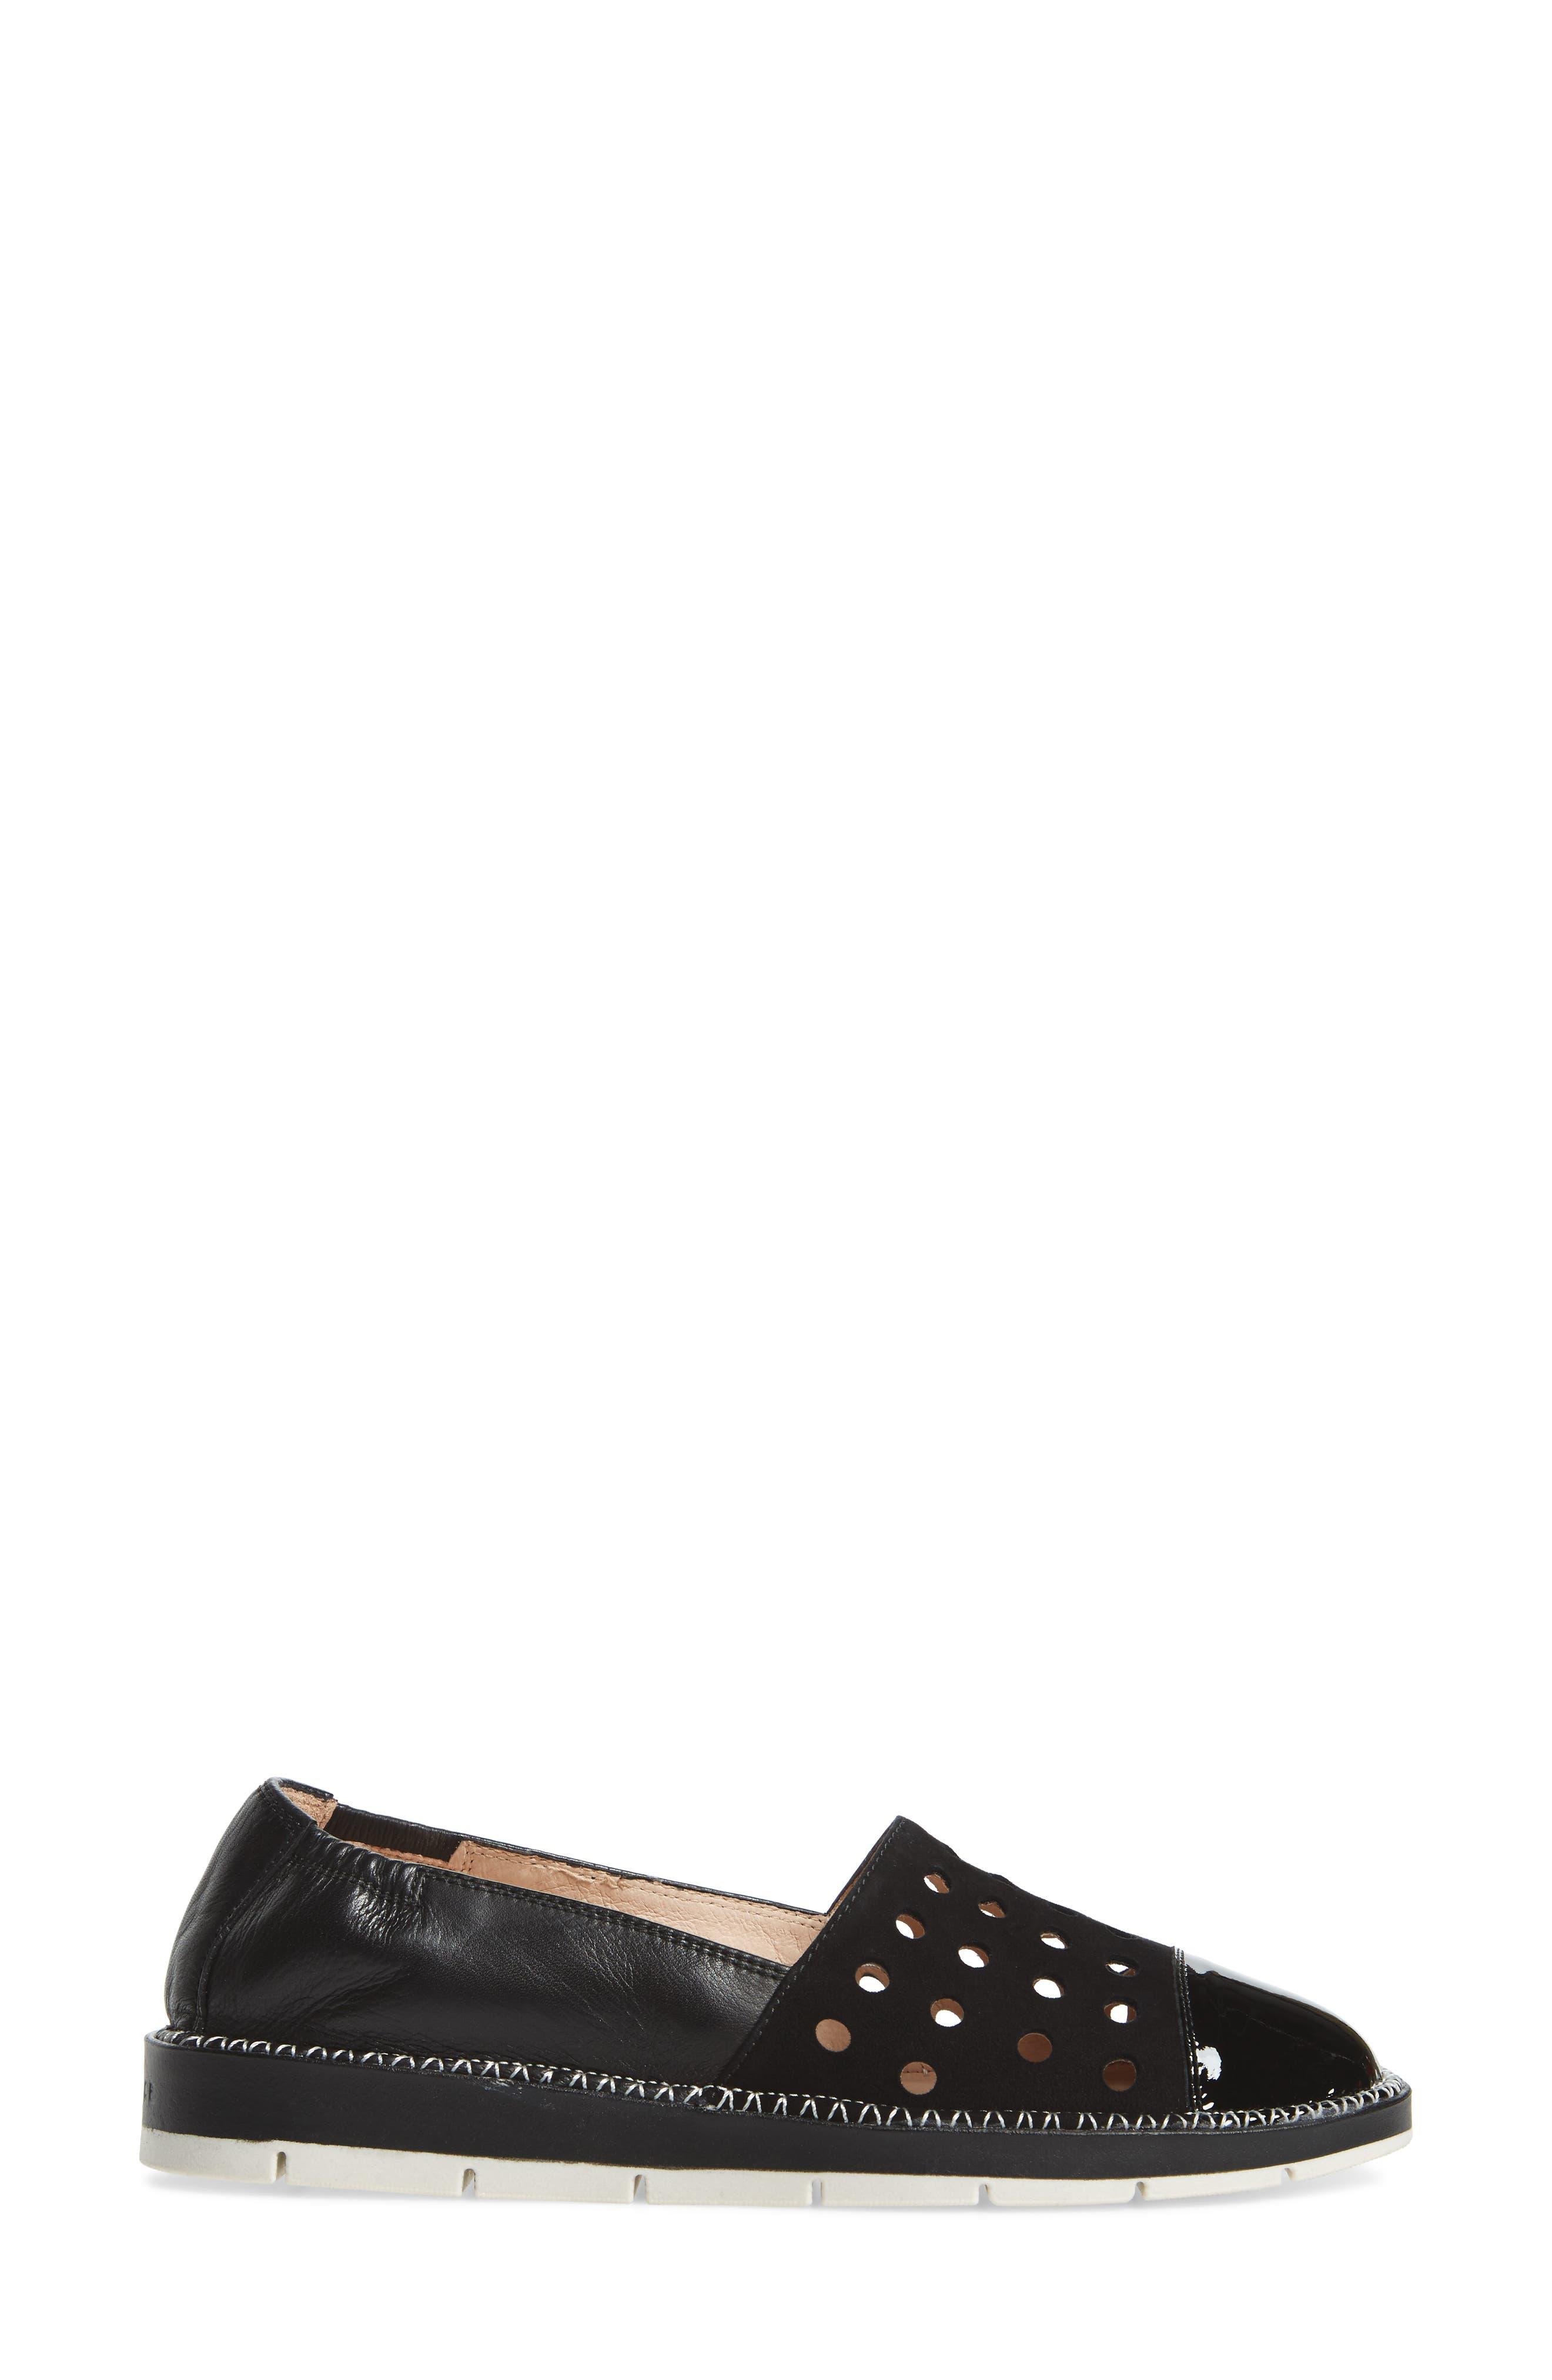 Maiko Flat,                             Alternate thumbnail 3, color,                             Kaffir Black Leather